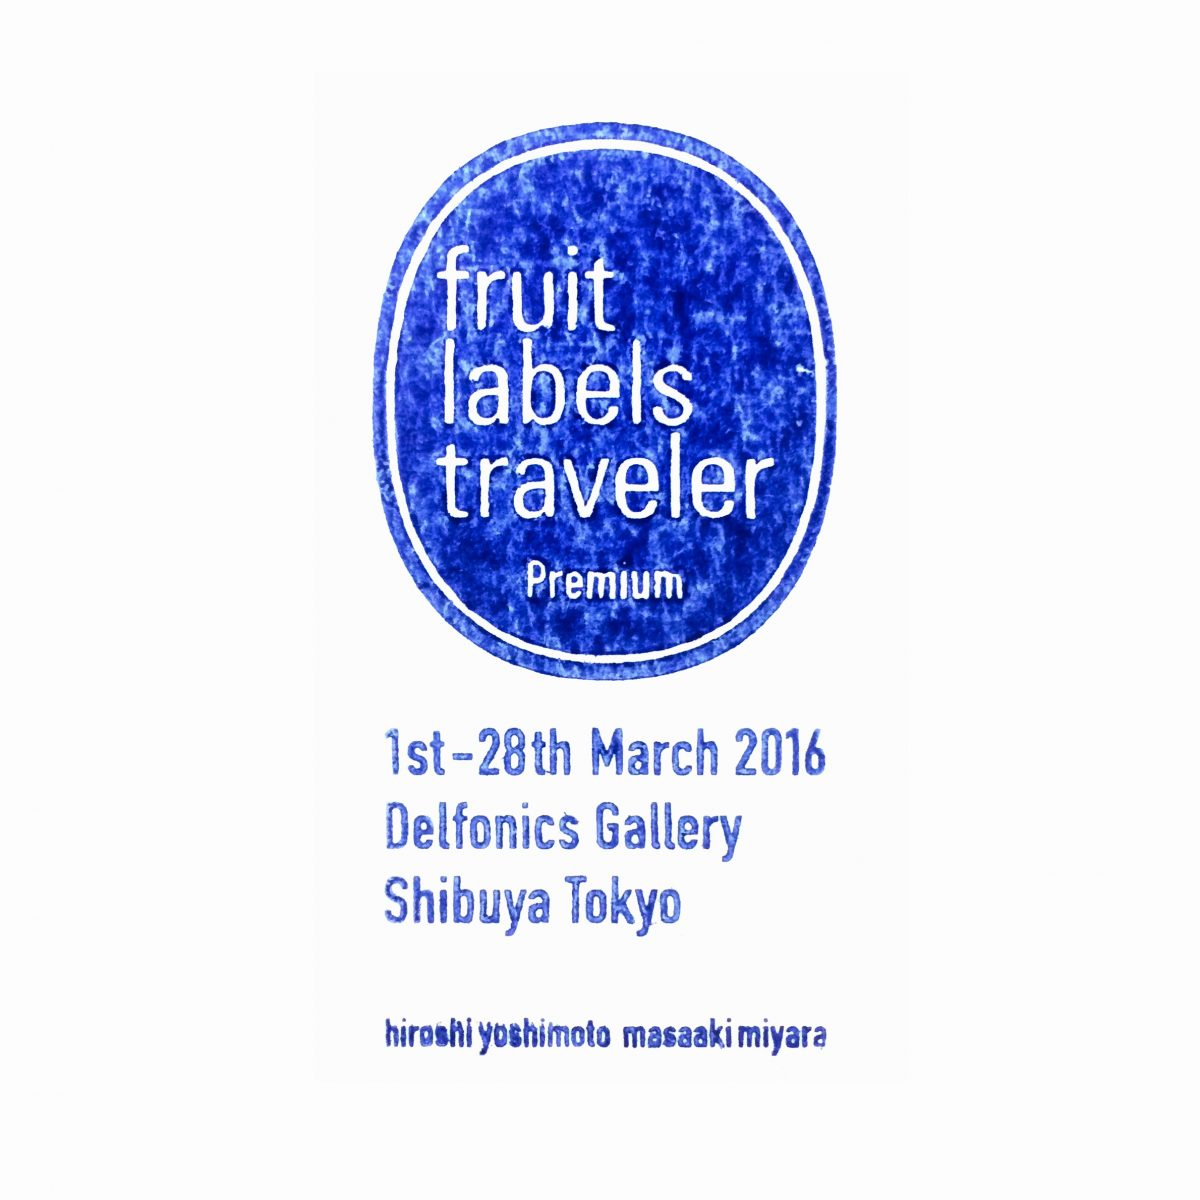 Delfonics|Fruit Labels Traveler 旅するフルーツシール展|デルフォニックス渋谷ギャラリー|グラフィックデザイン